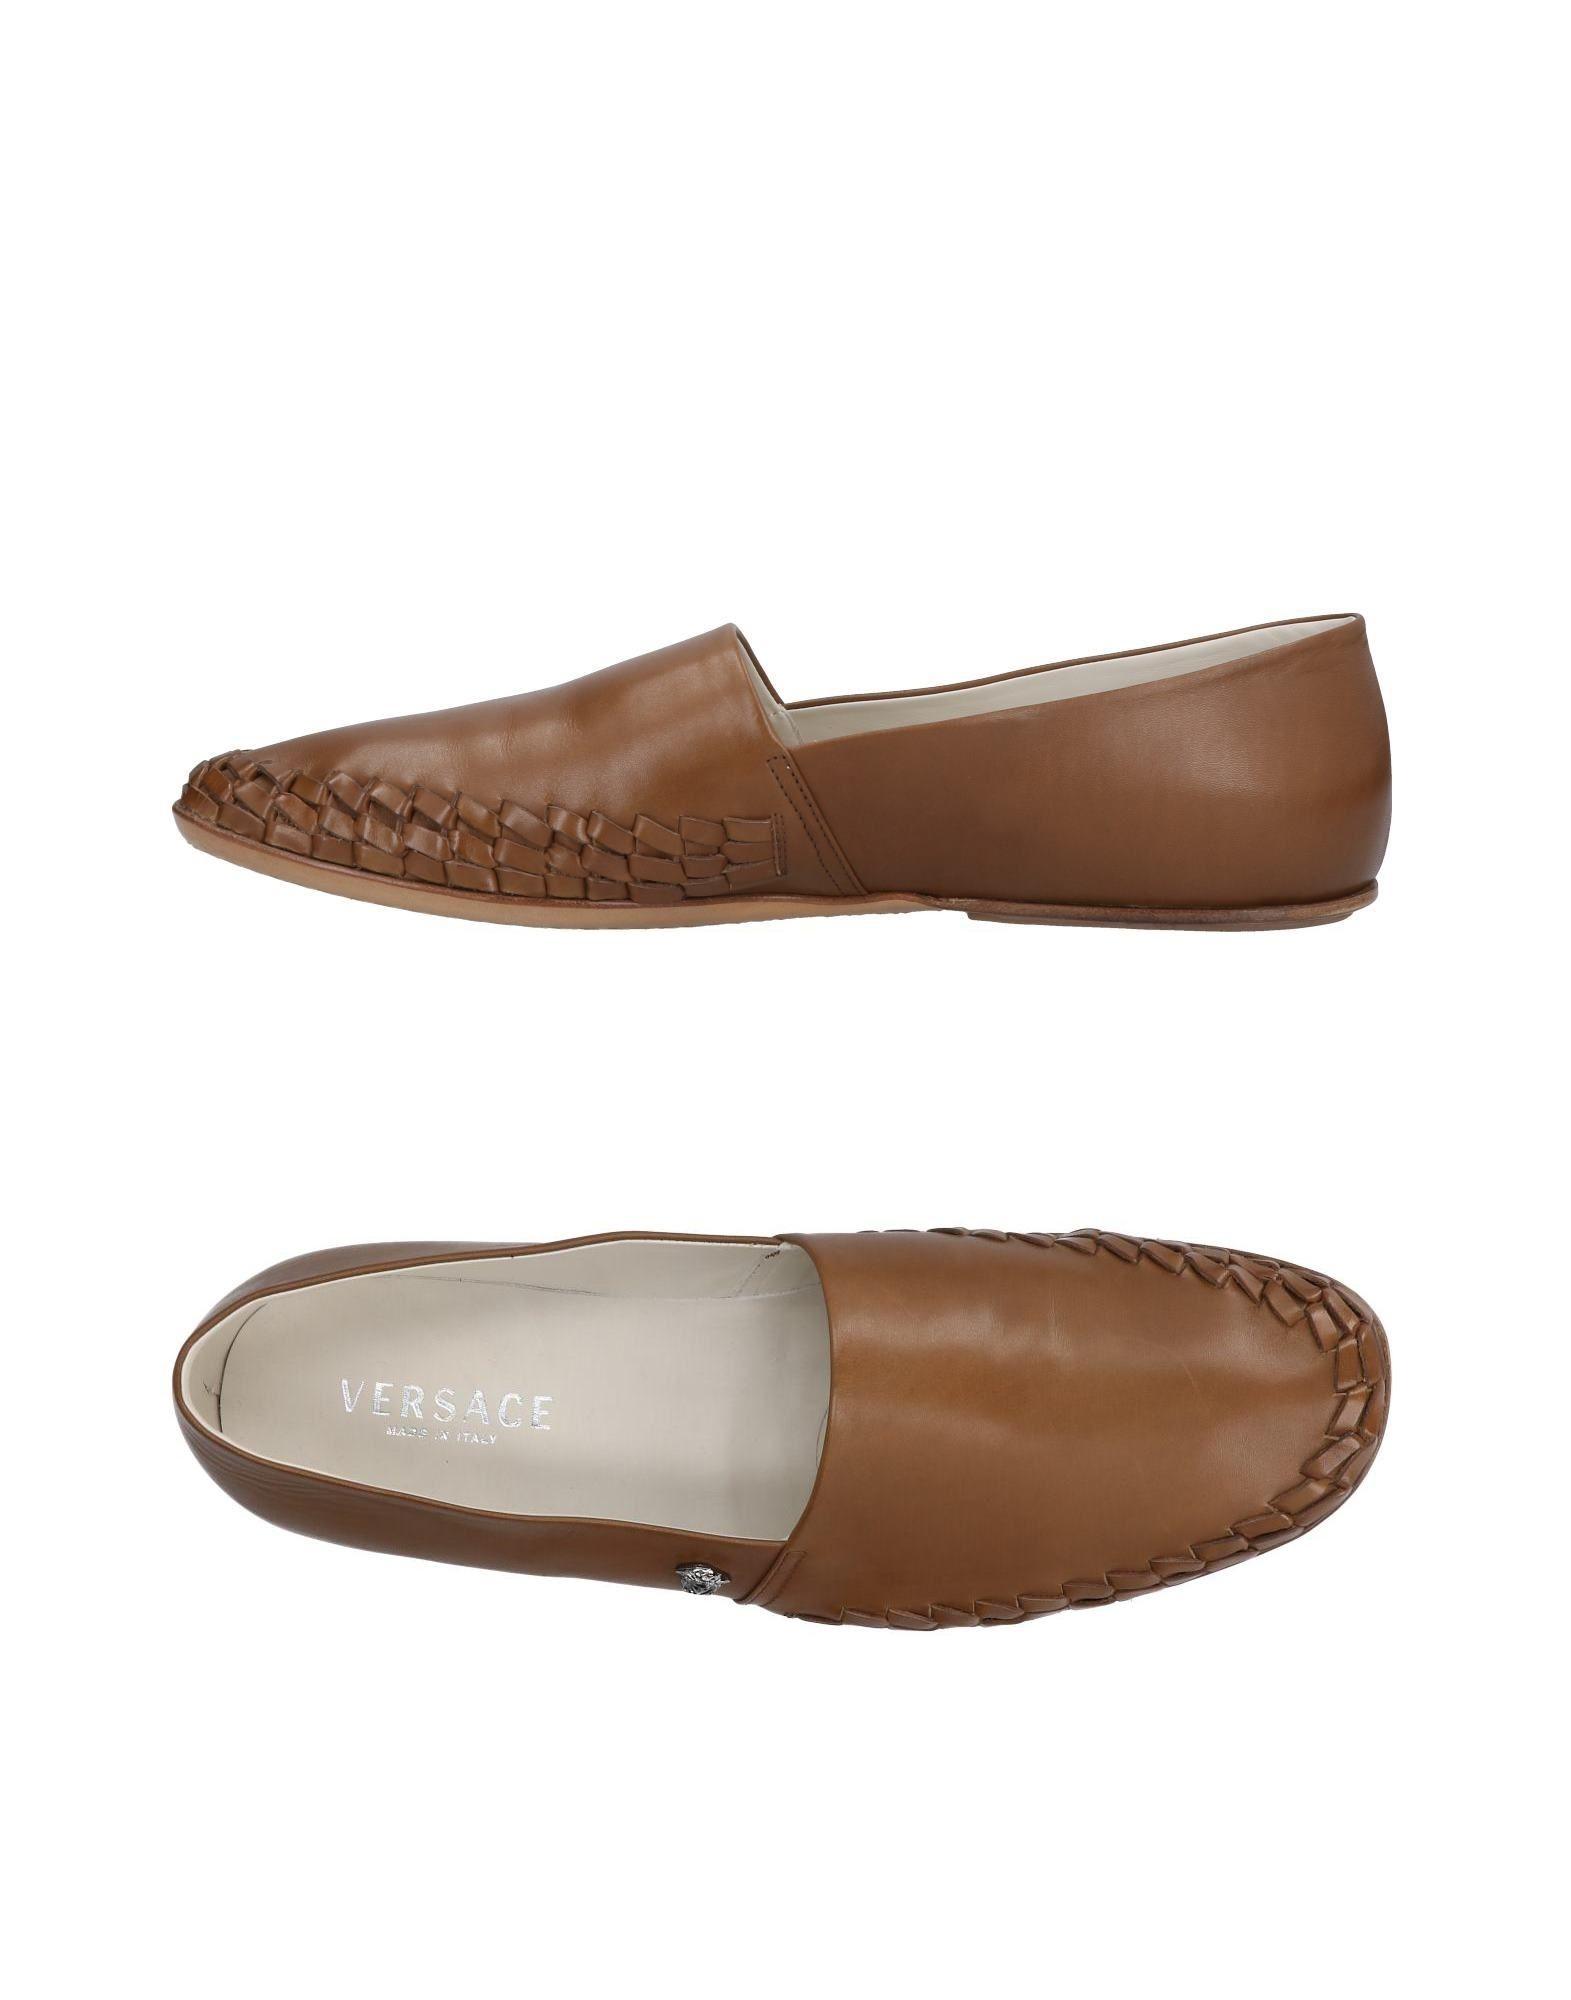 Versace Mokassins Herren  11493273SQ Gute Qualität beliebte Schuhe